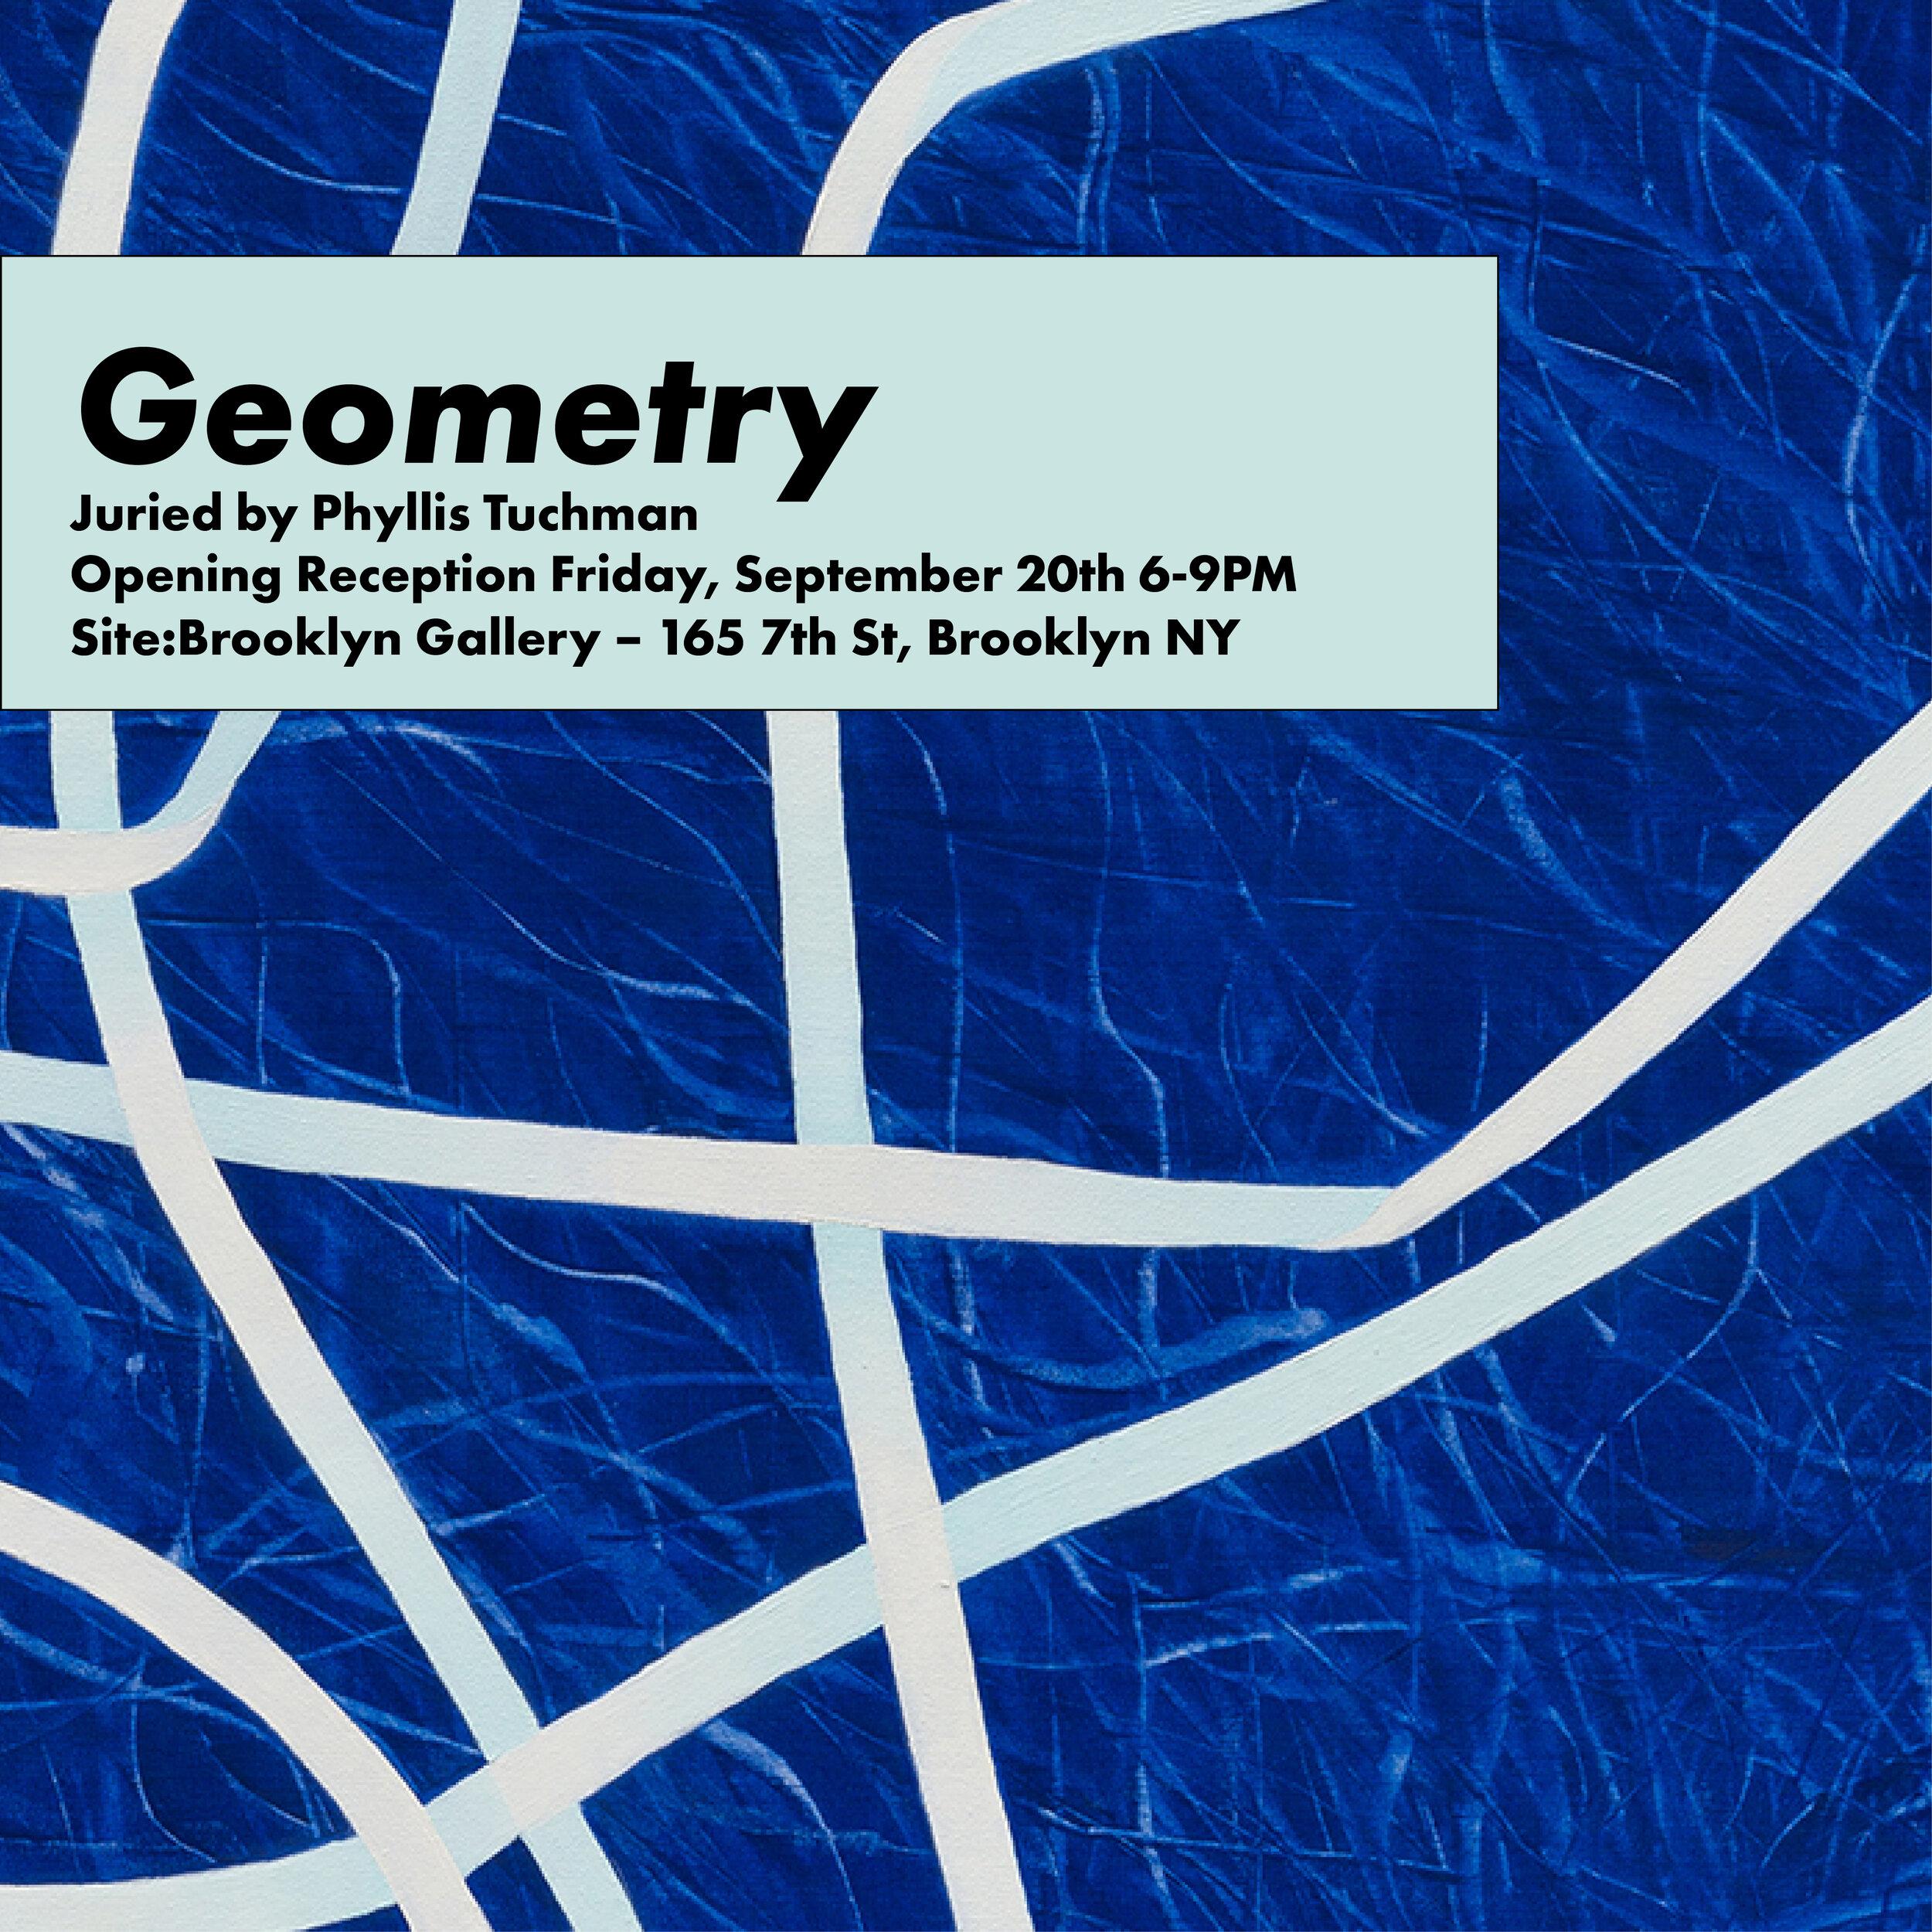 Geometry-Artist-Promotion-SiteBrooklyn-Gallery2.jpg